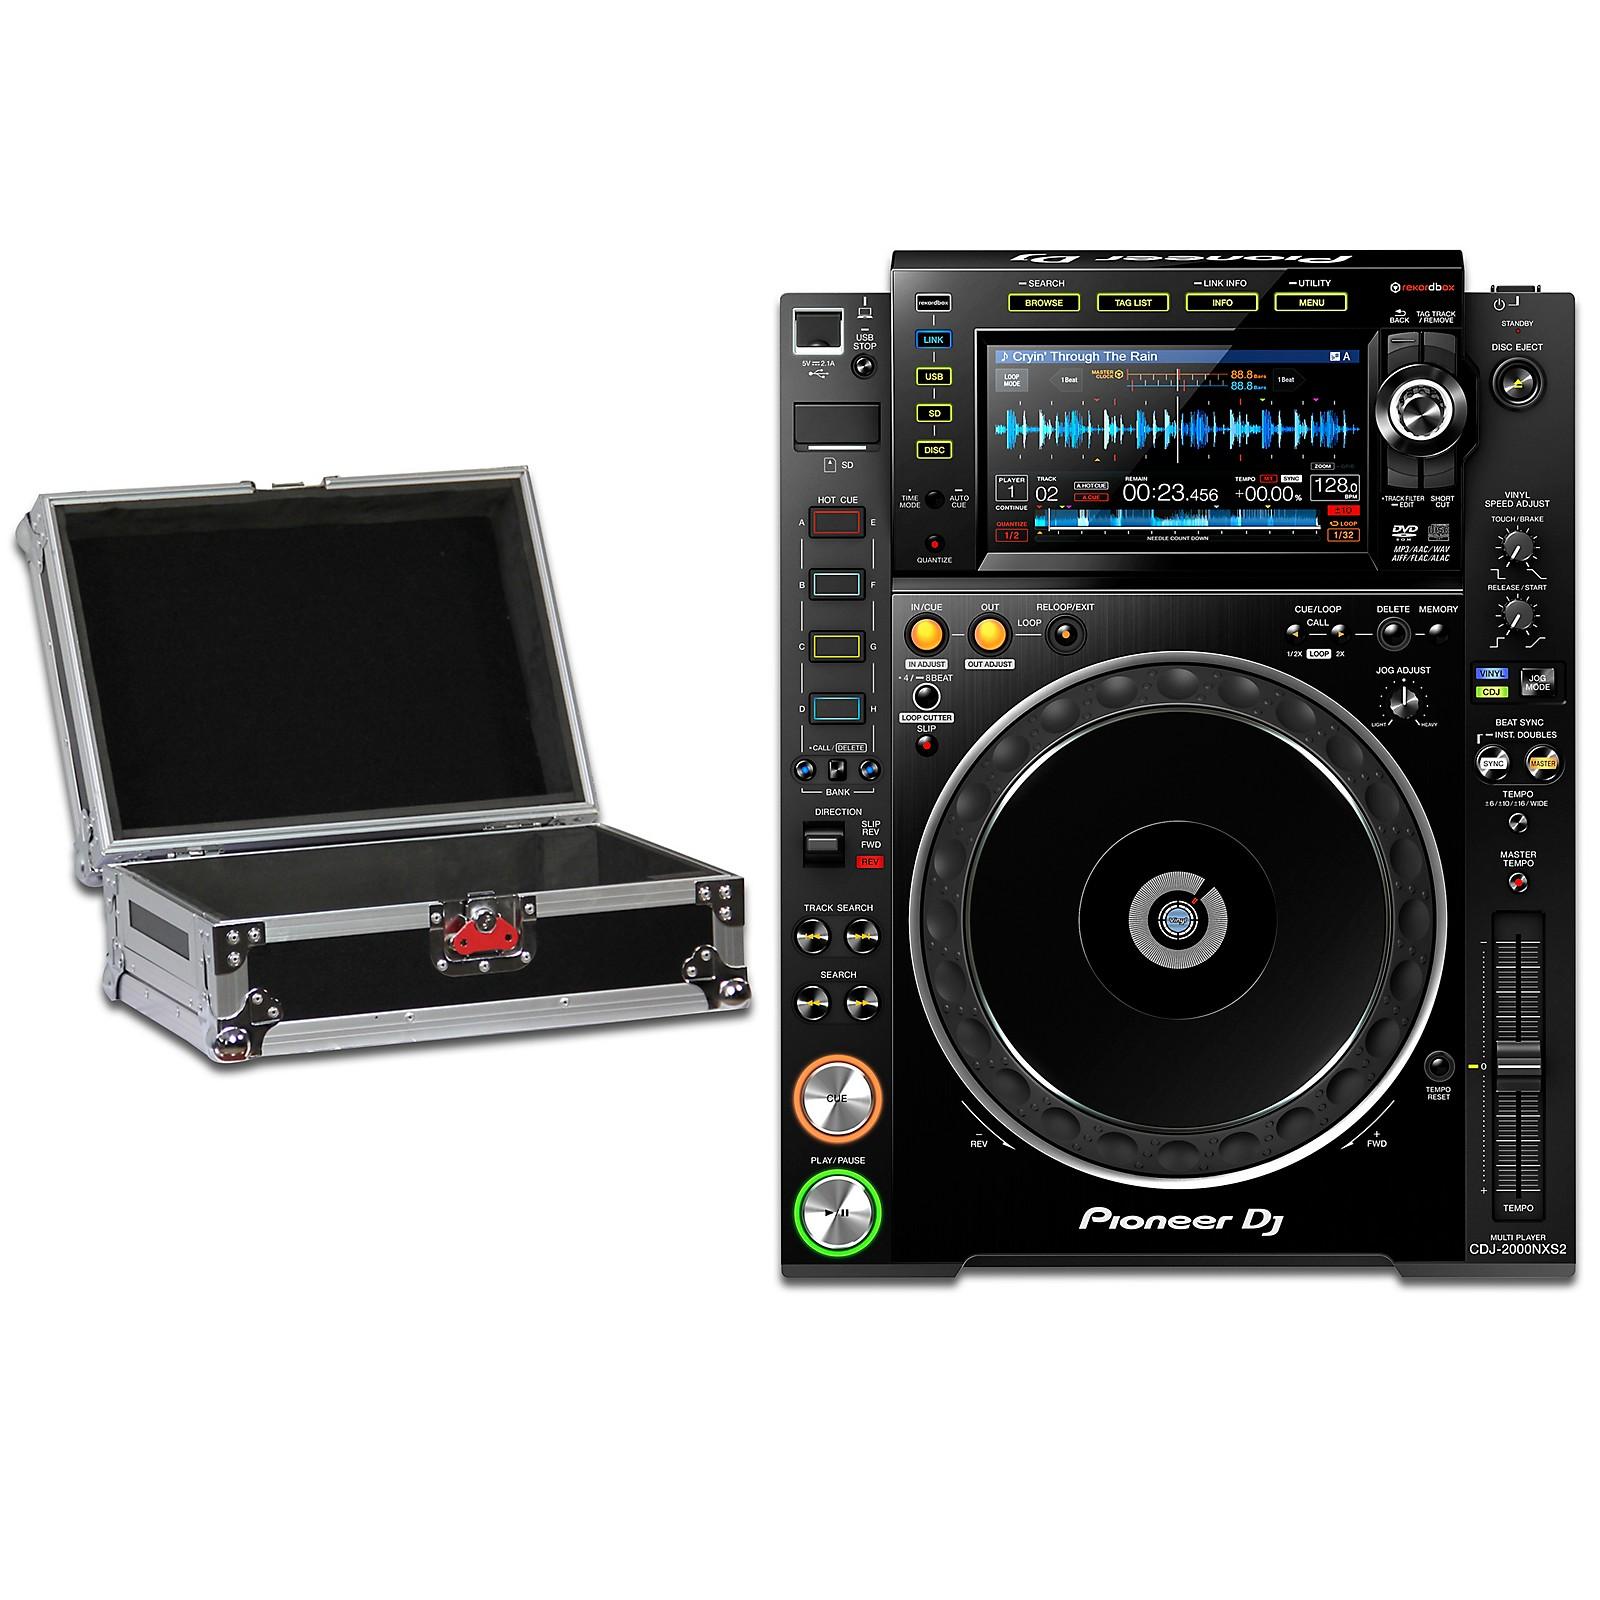 Pioneer CDJ-2000NXS2 Professional DJ Media Player with Case